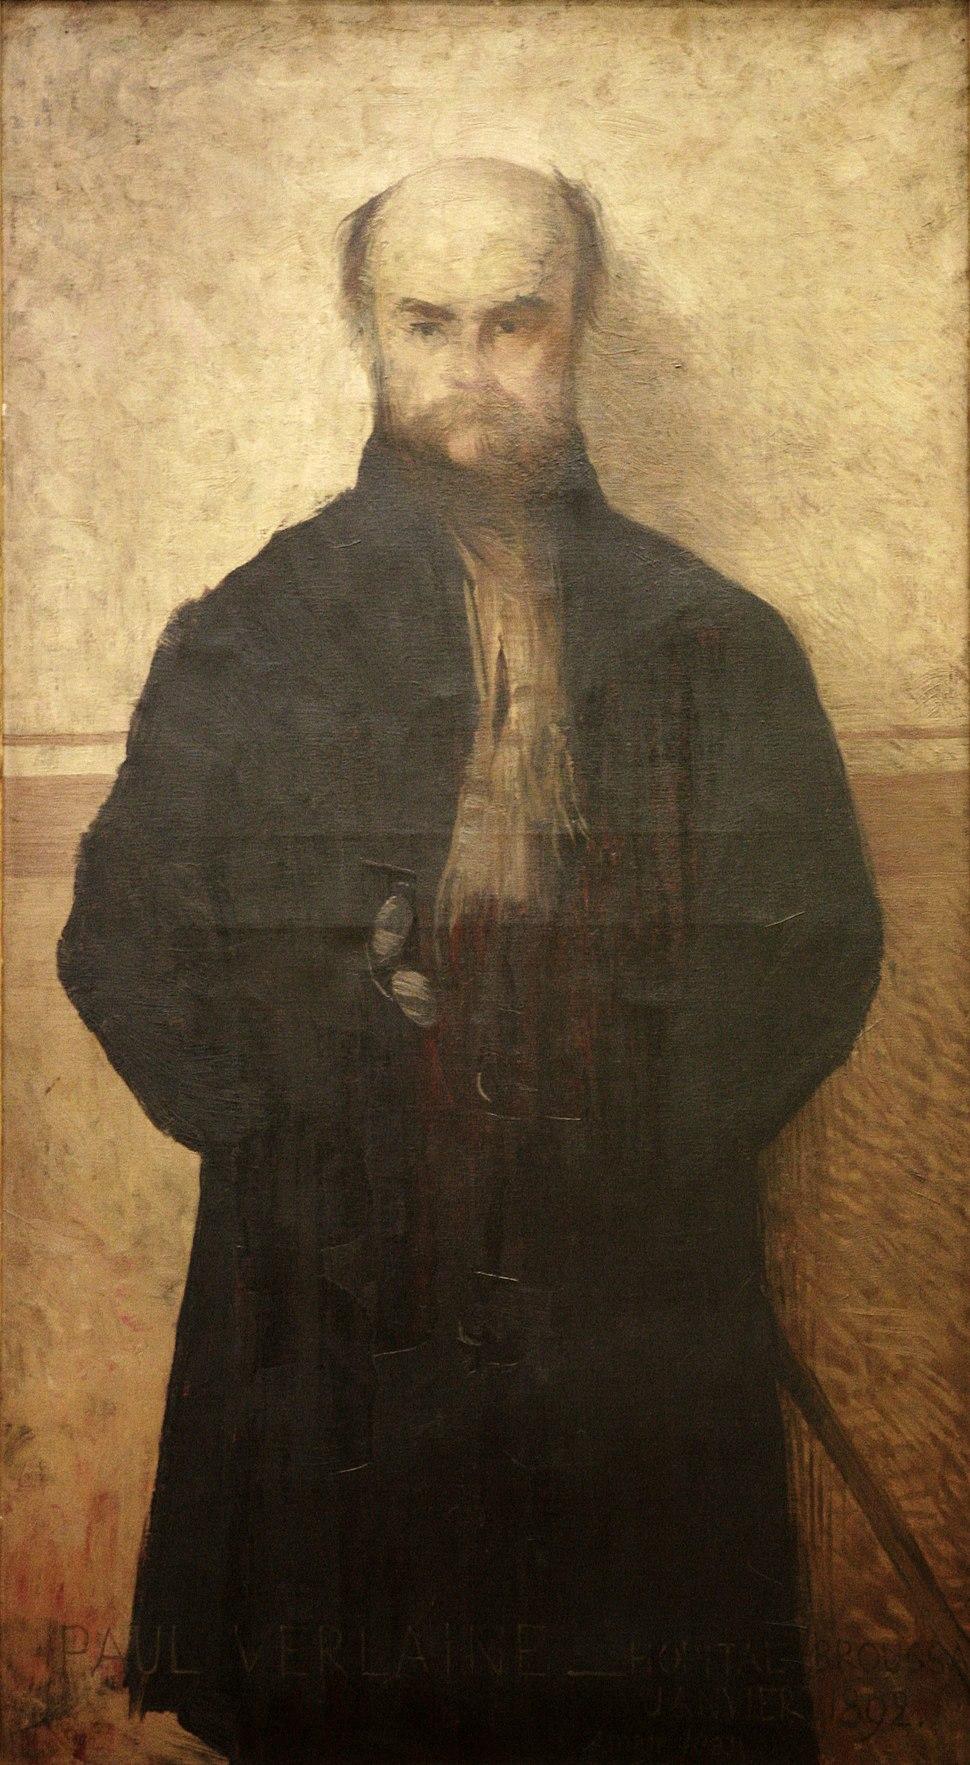 Paul Verlaine-Edmond Aman-Jean mg 9503